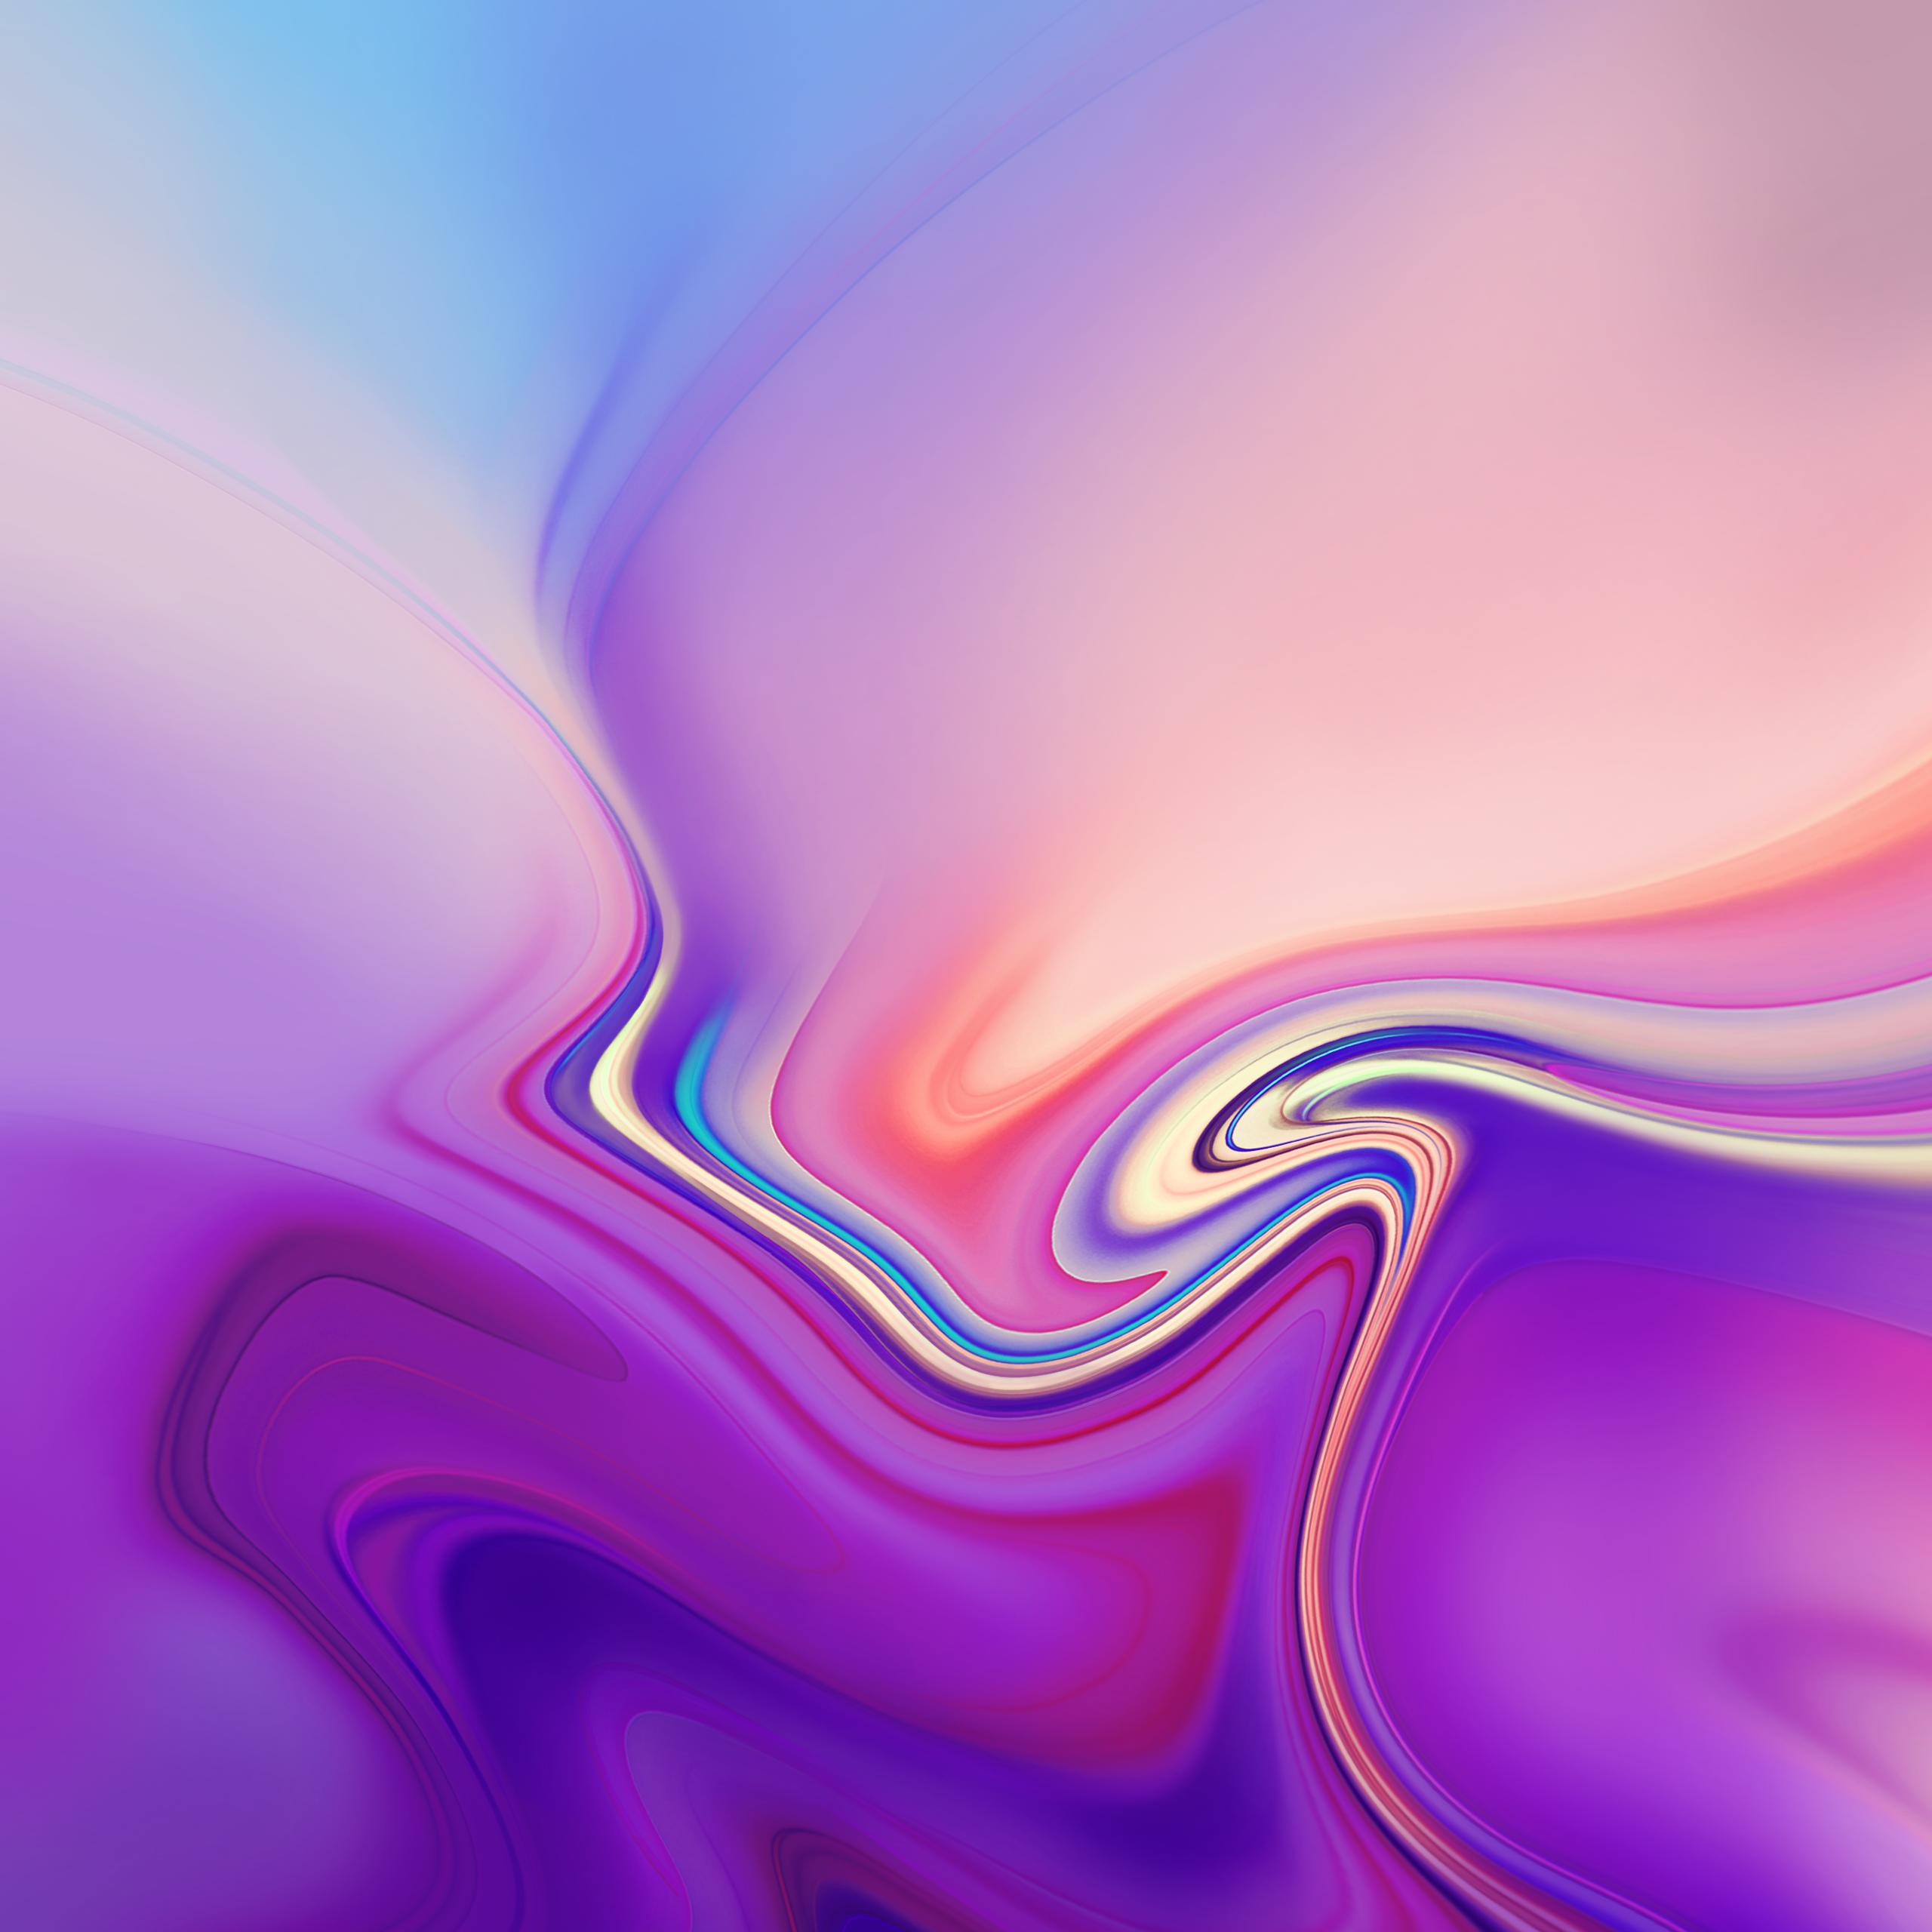 Download Samsung Galaxy Tab S4 Wallpaper Sammobile